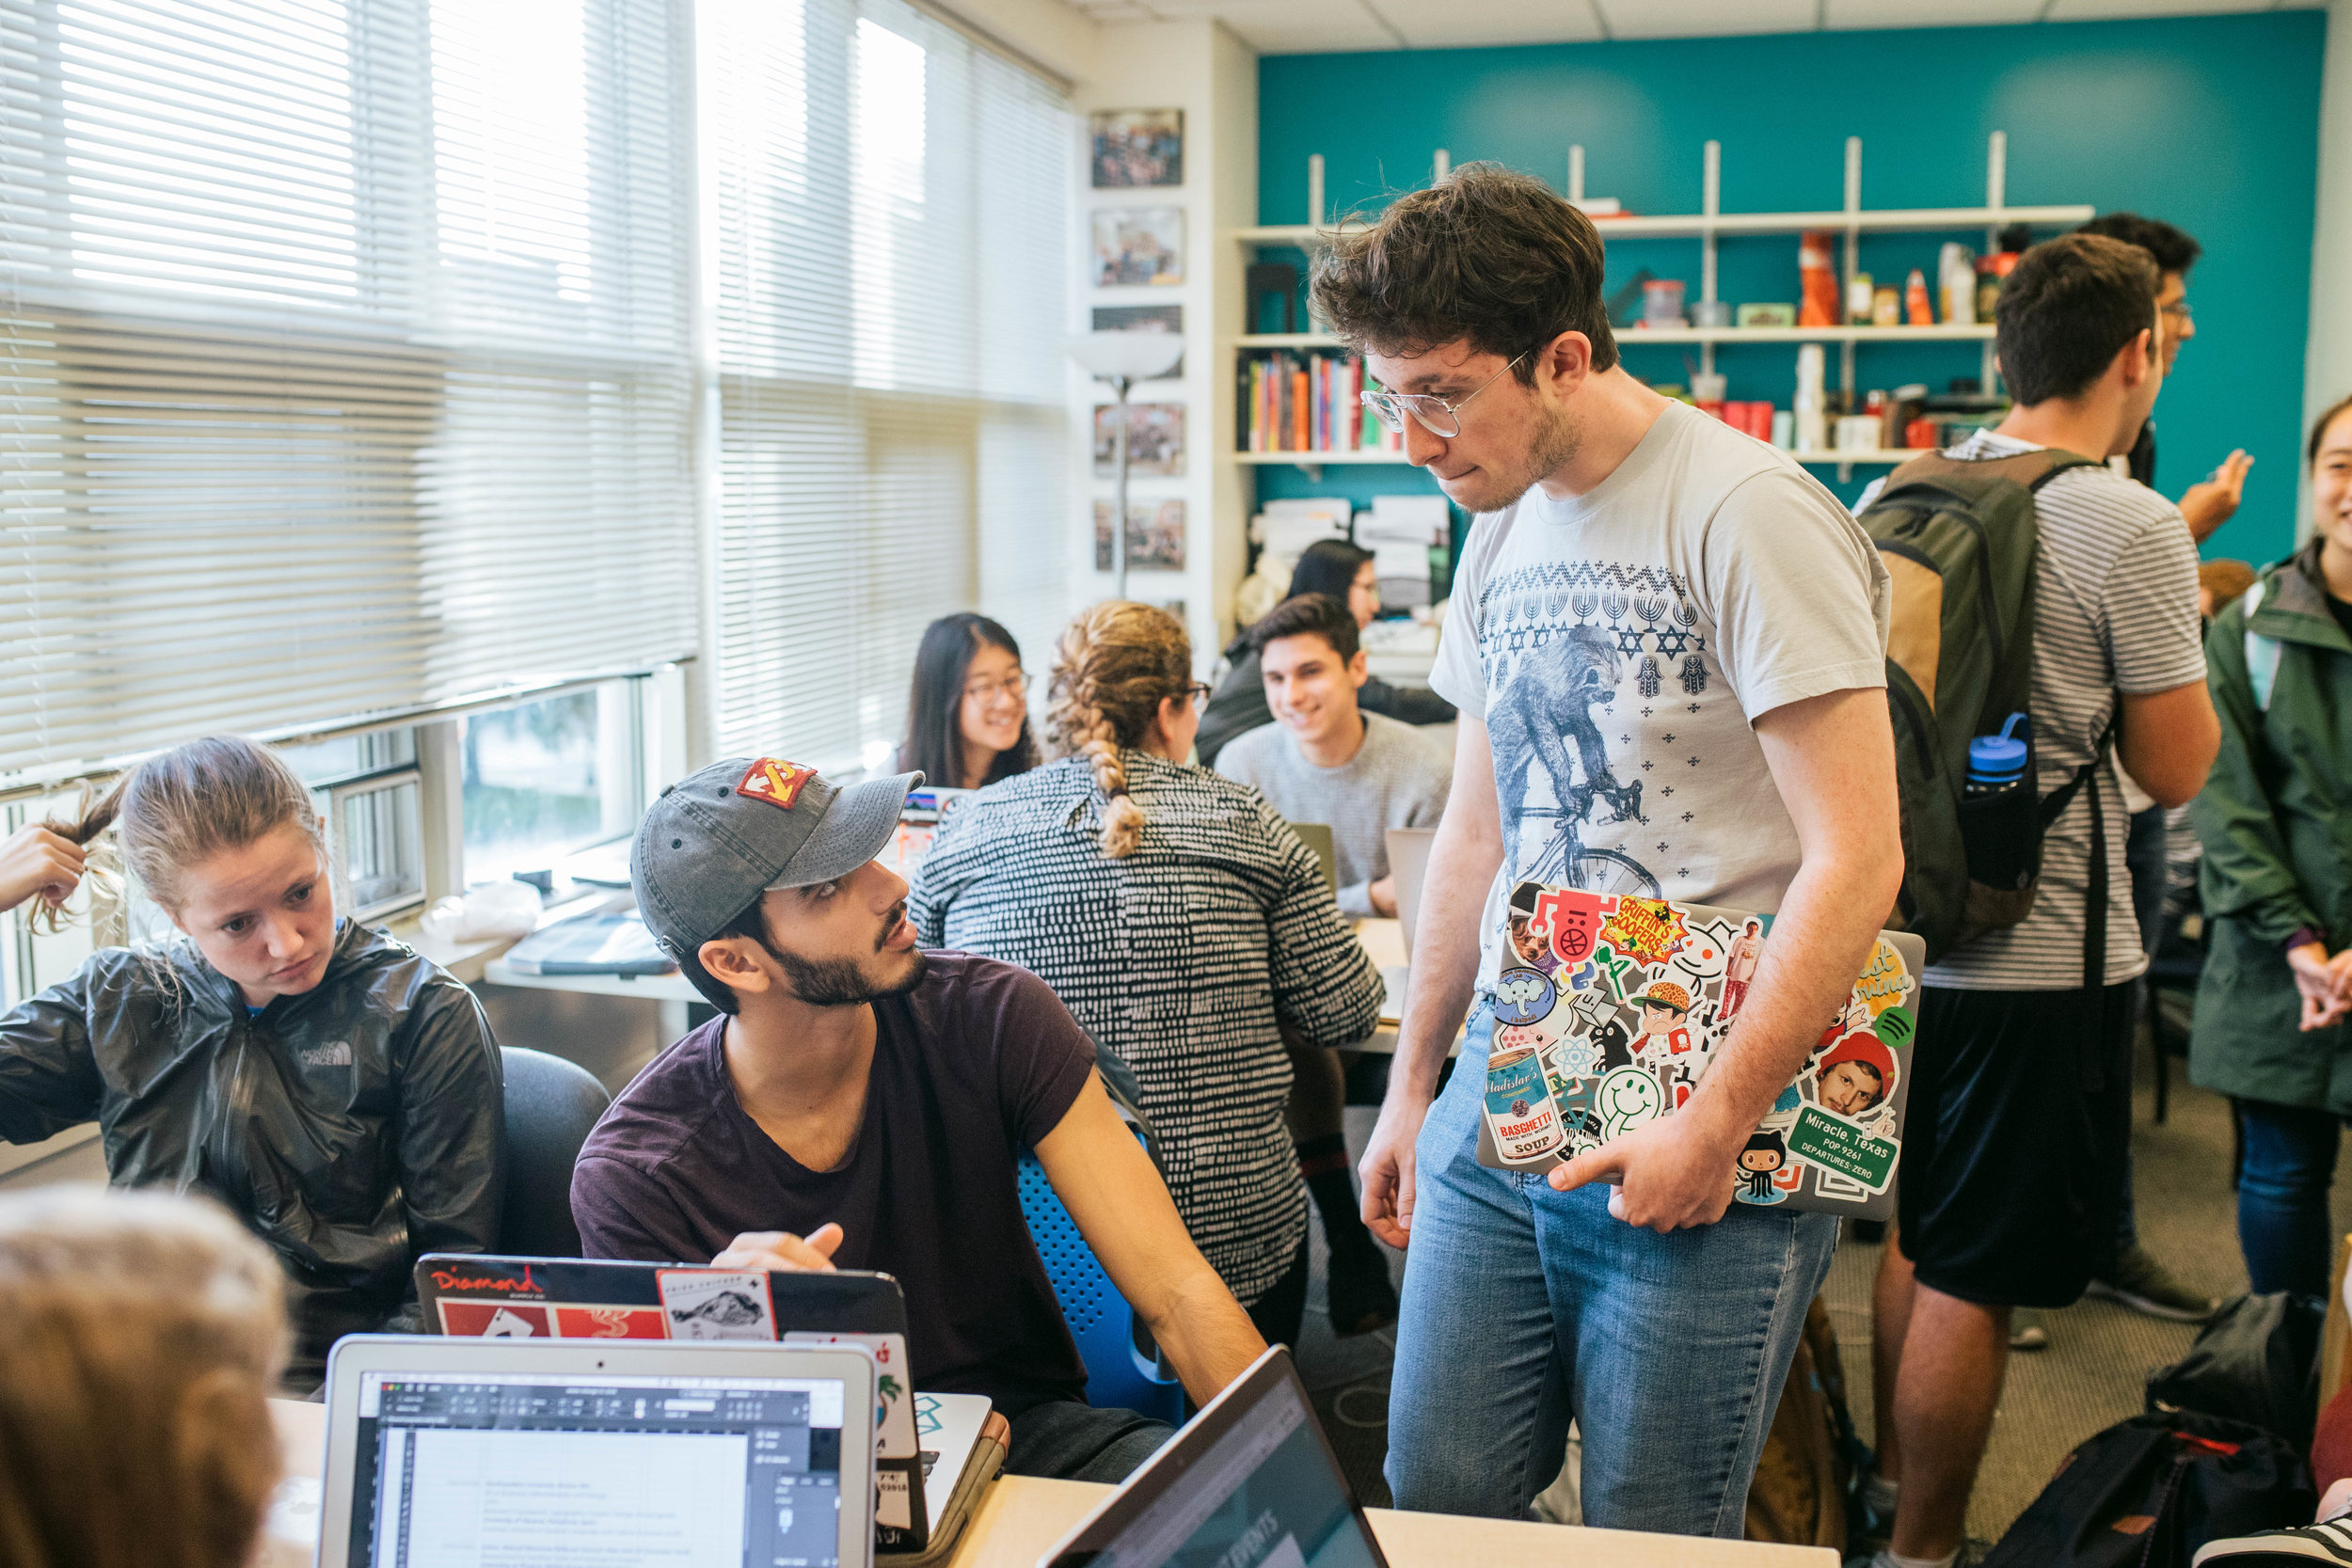 Northeastern University's student led design studio